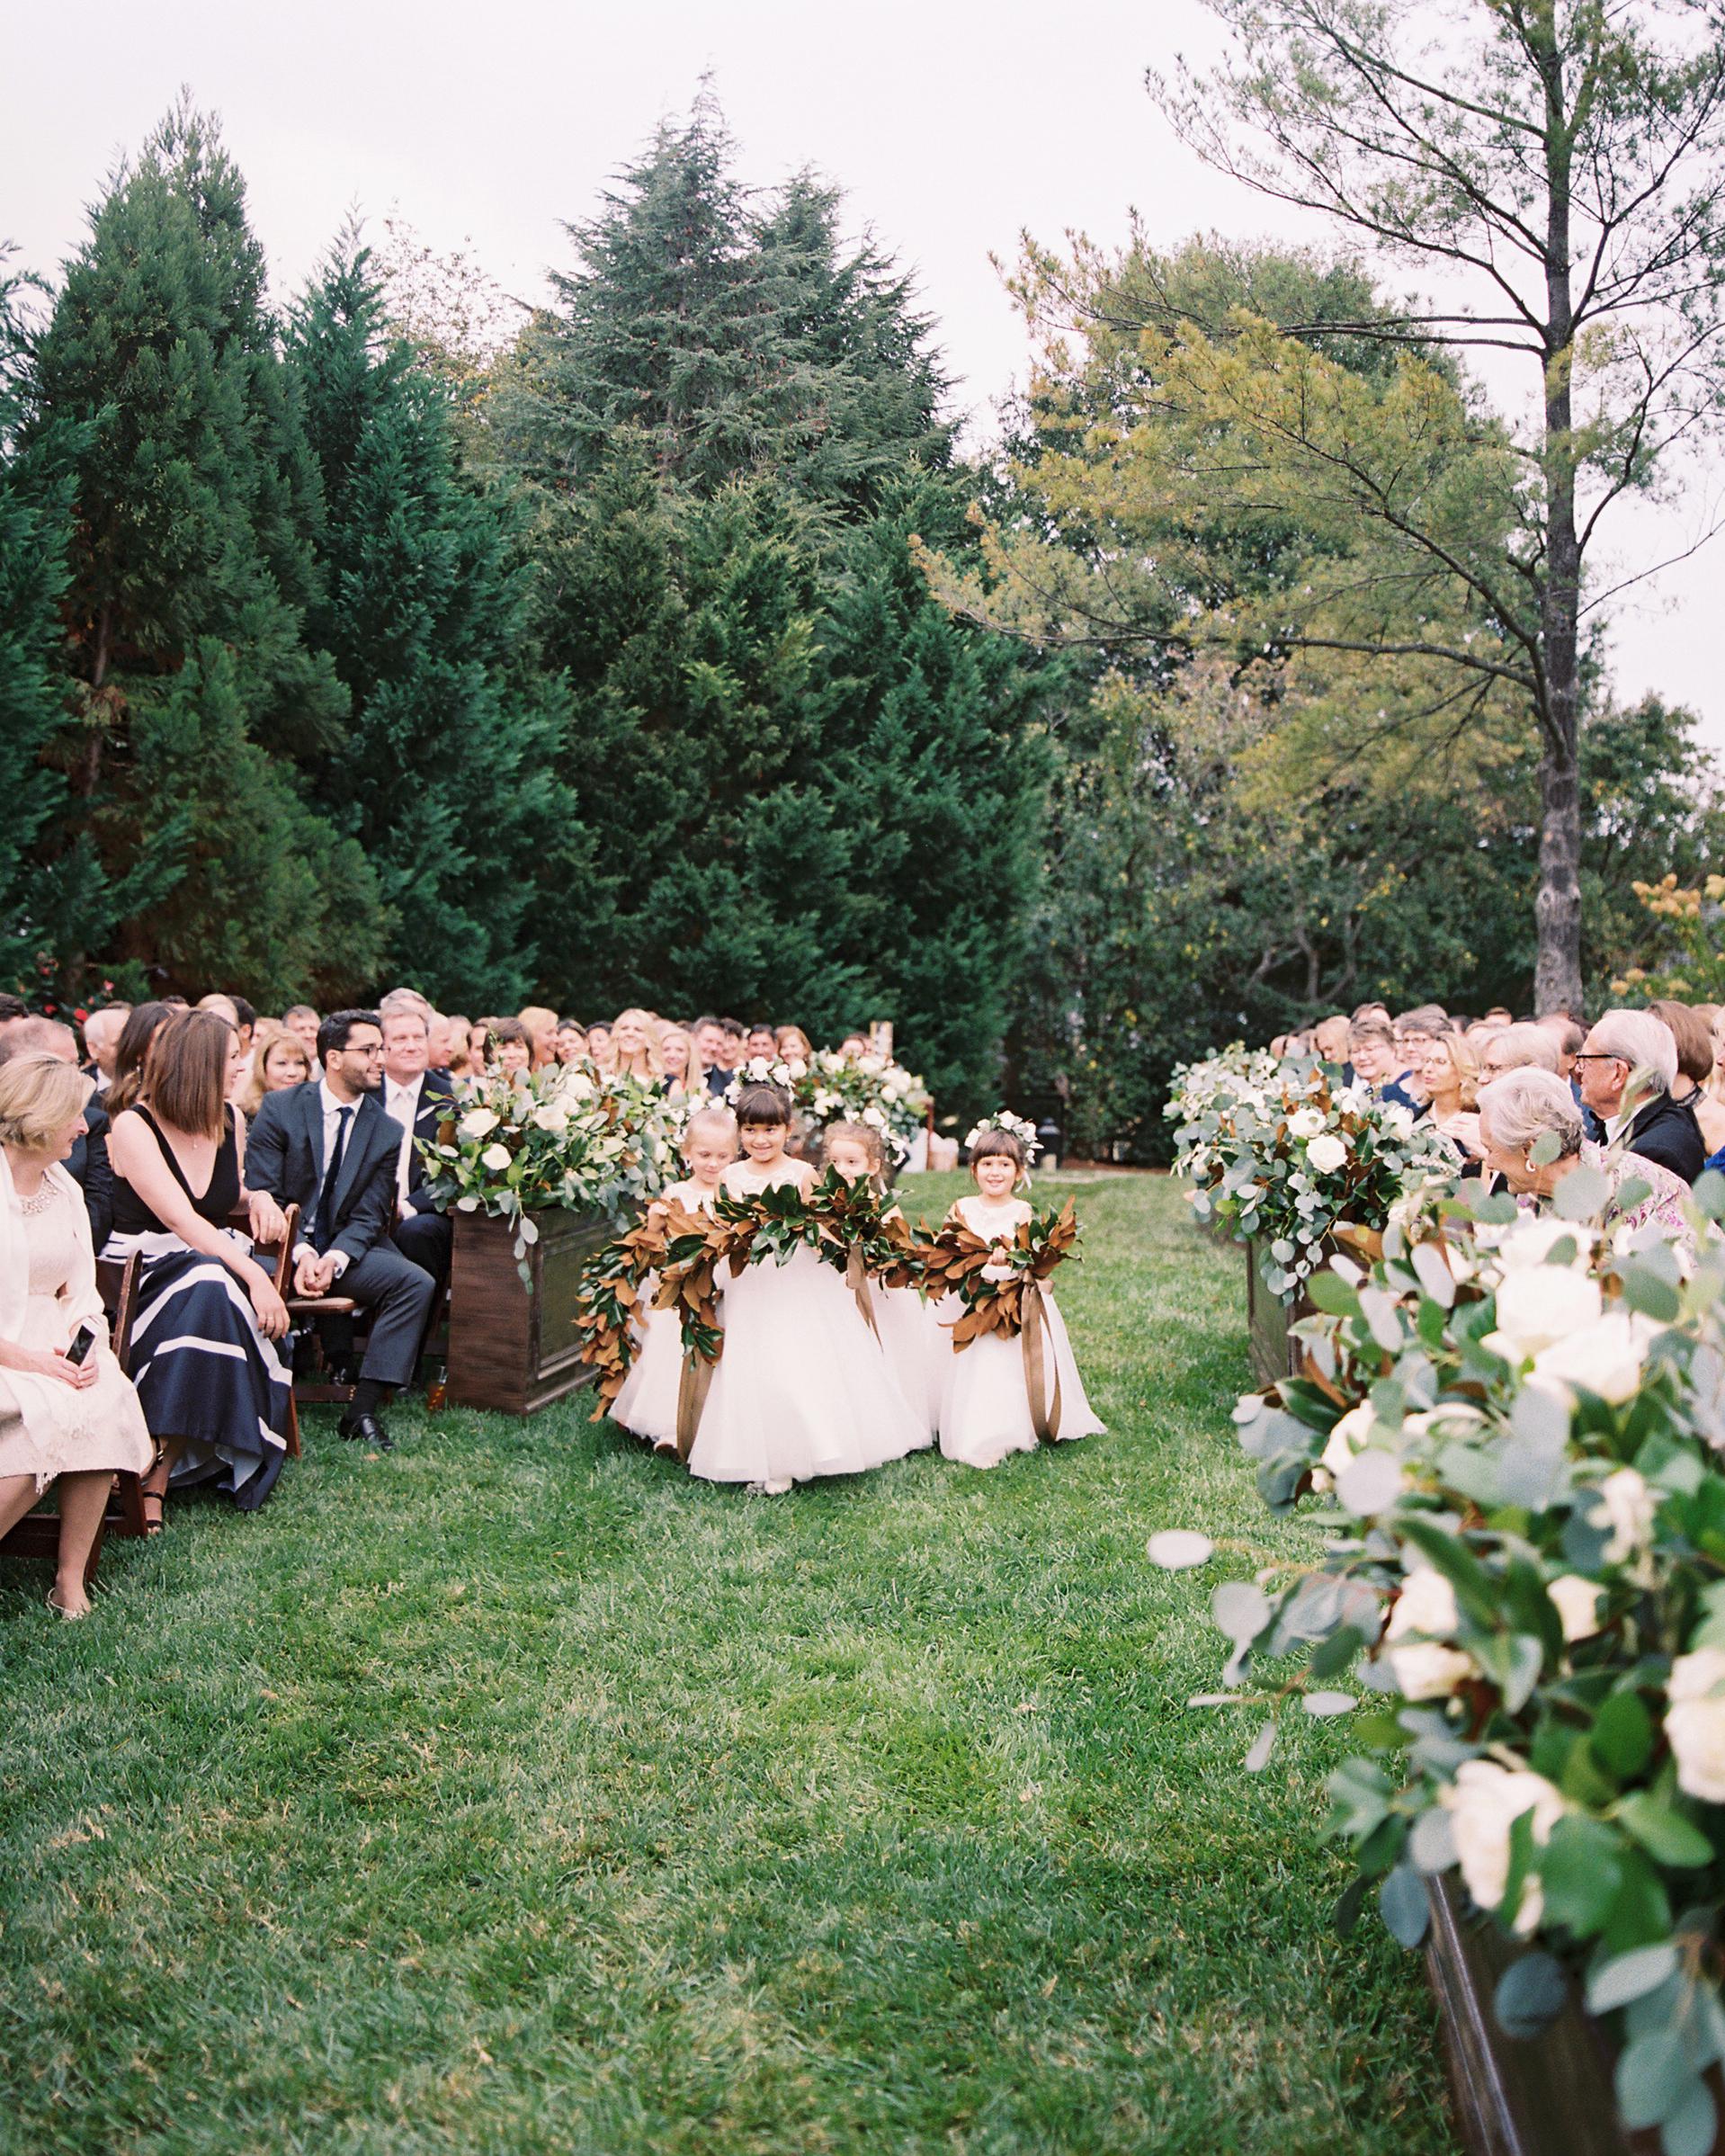 kendall nick wedding ceremony flower girls